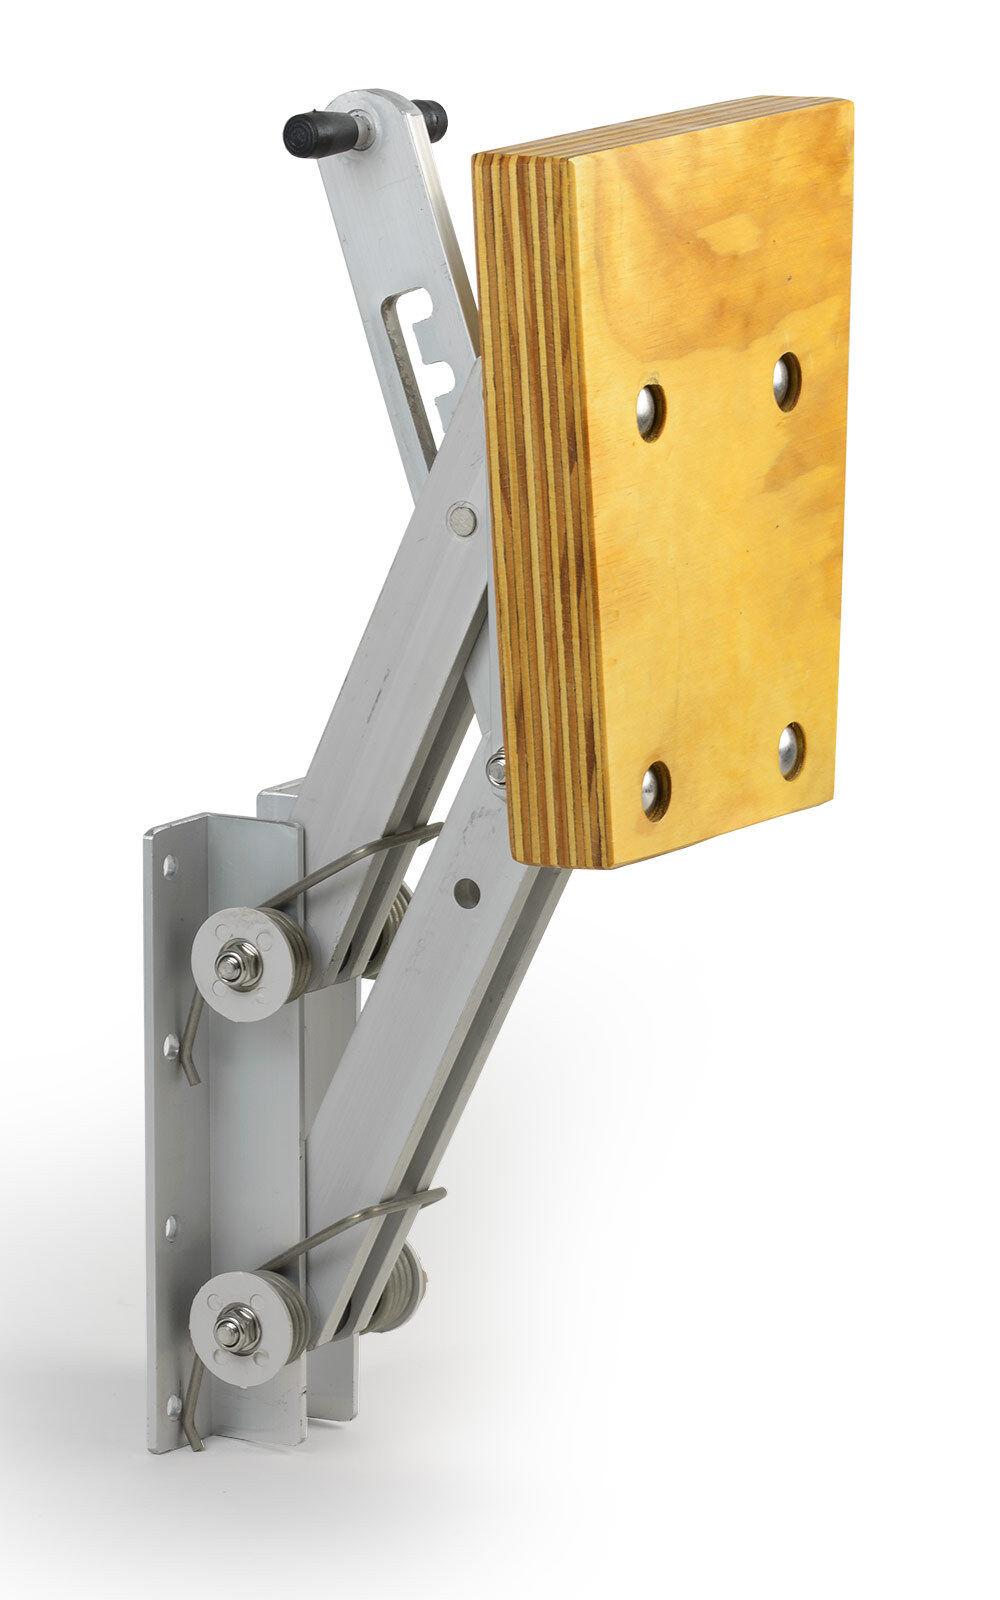 Außenborder-Halterung Motor-Halter Stiefel 7 PS 4 Positionen verstellbar Alu Holz